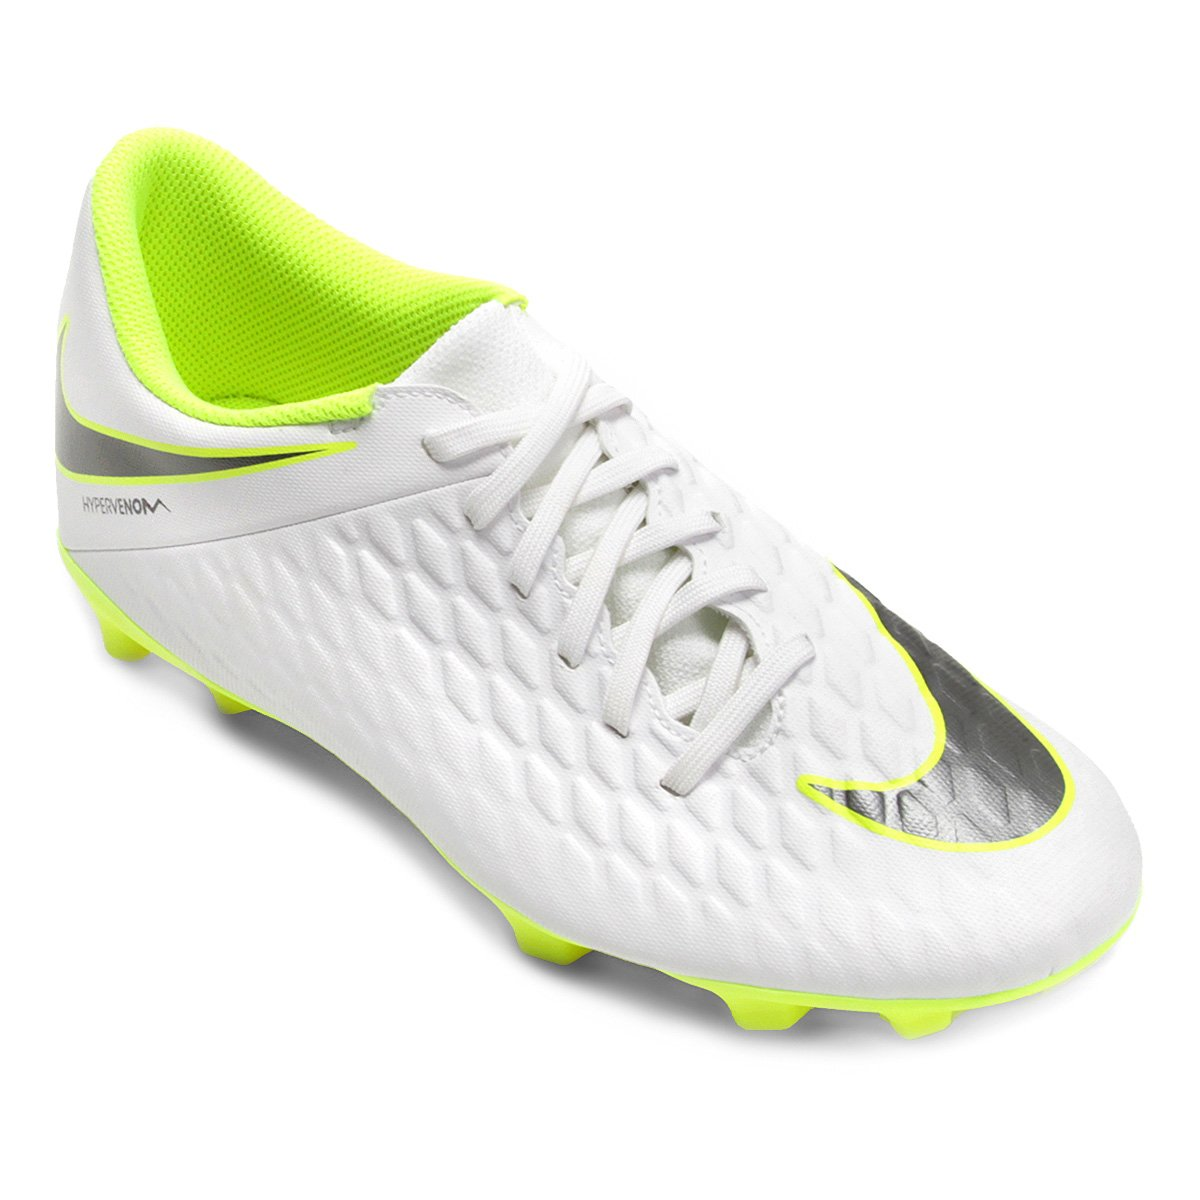 4eebf63c97 Chuteira Campo Nike Hypervenom Phantom 3 Club FG